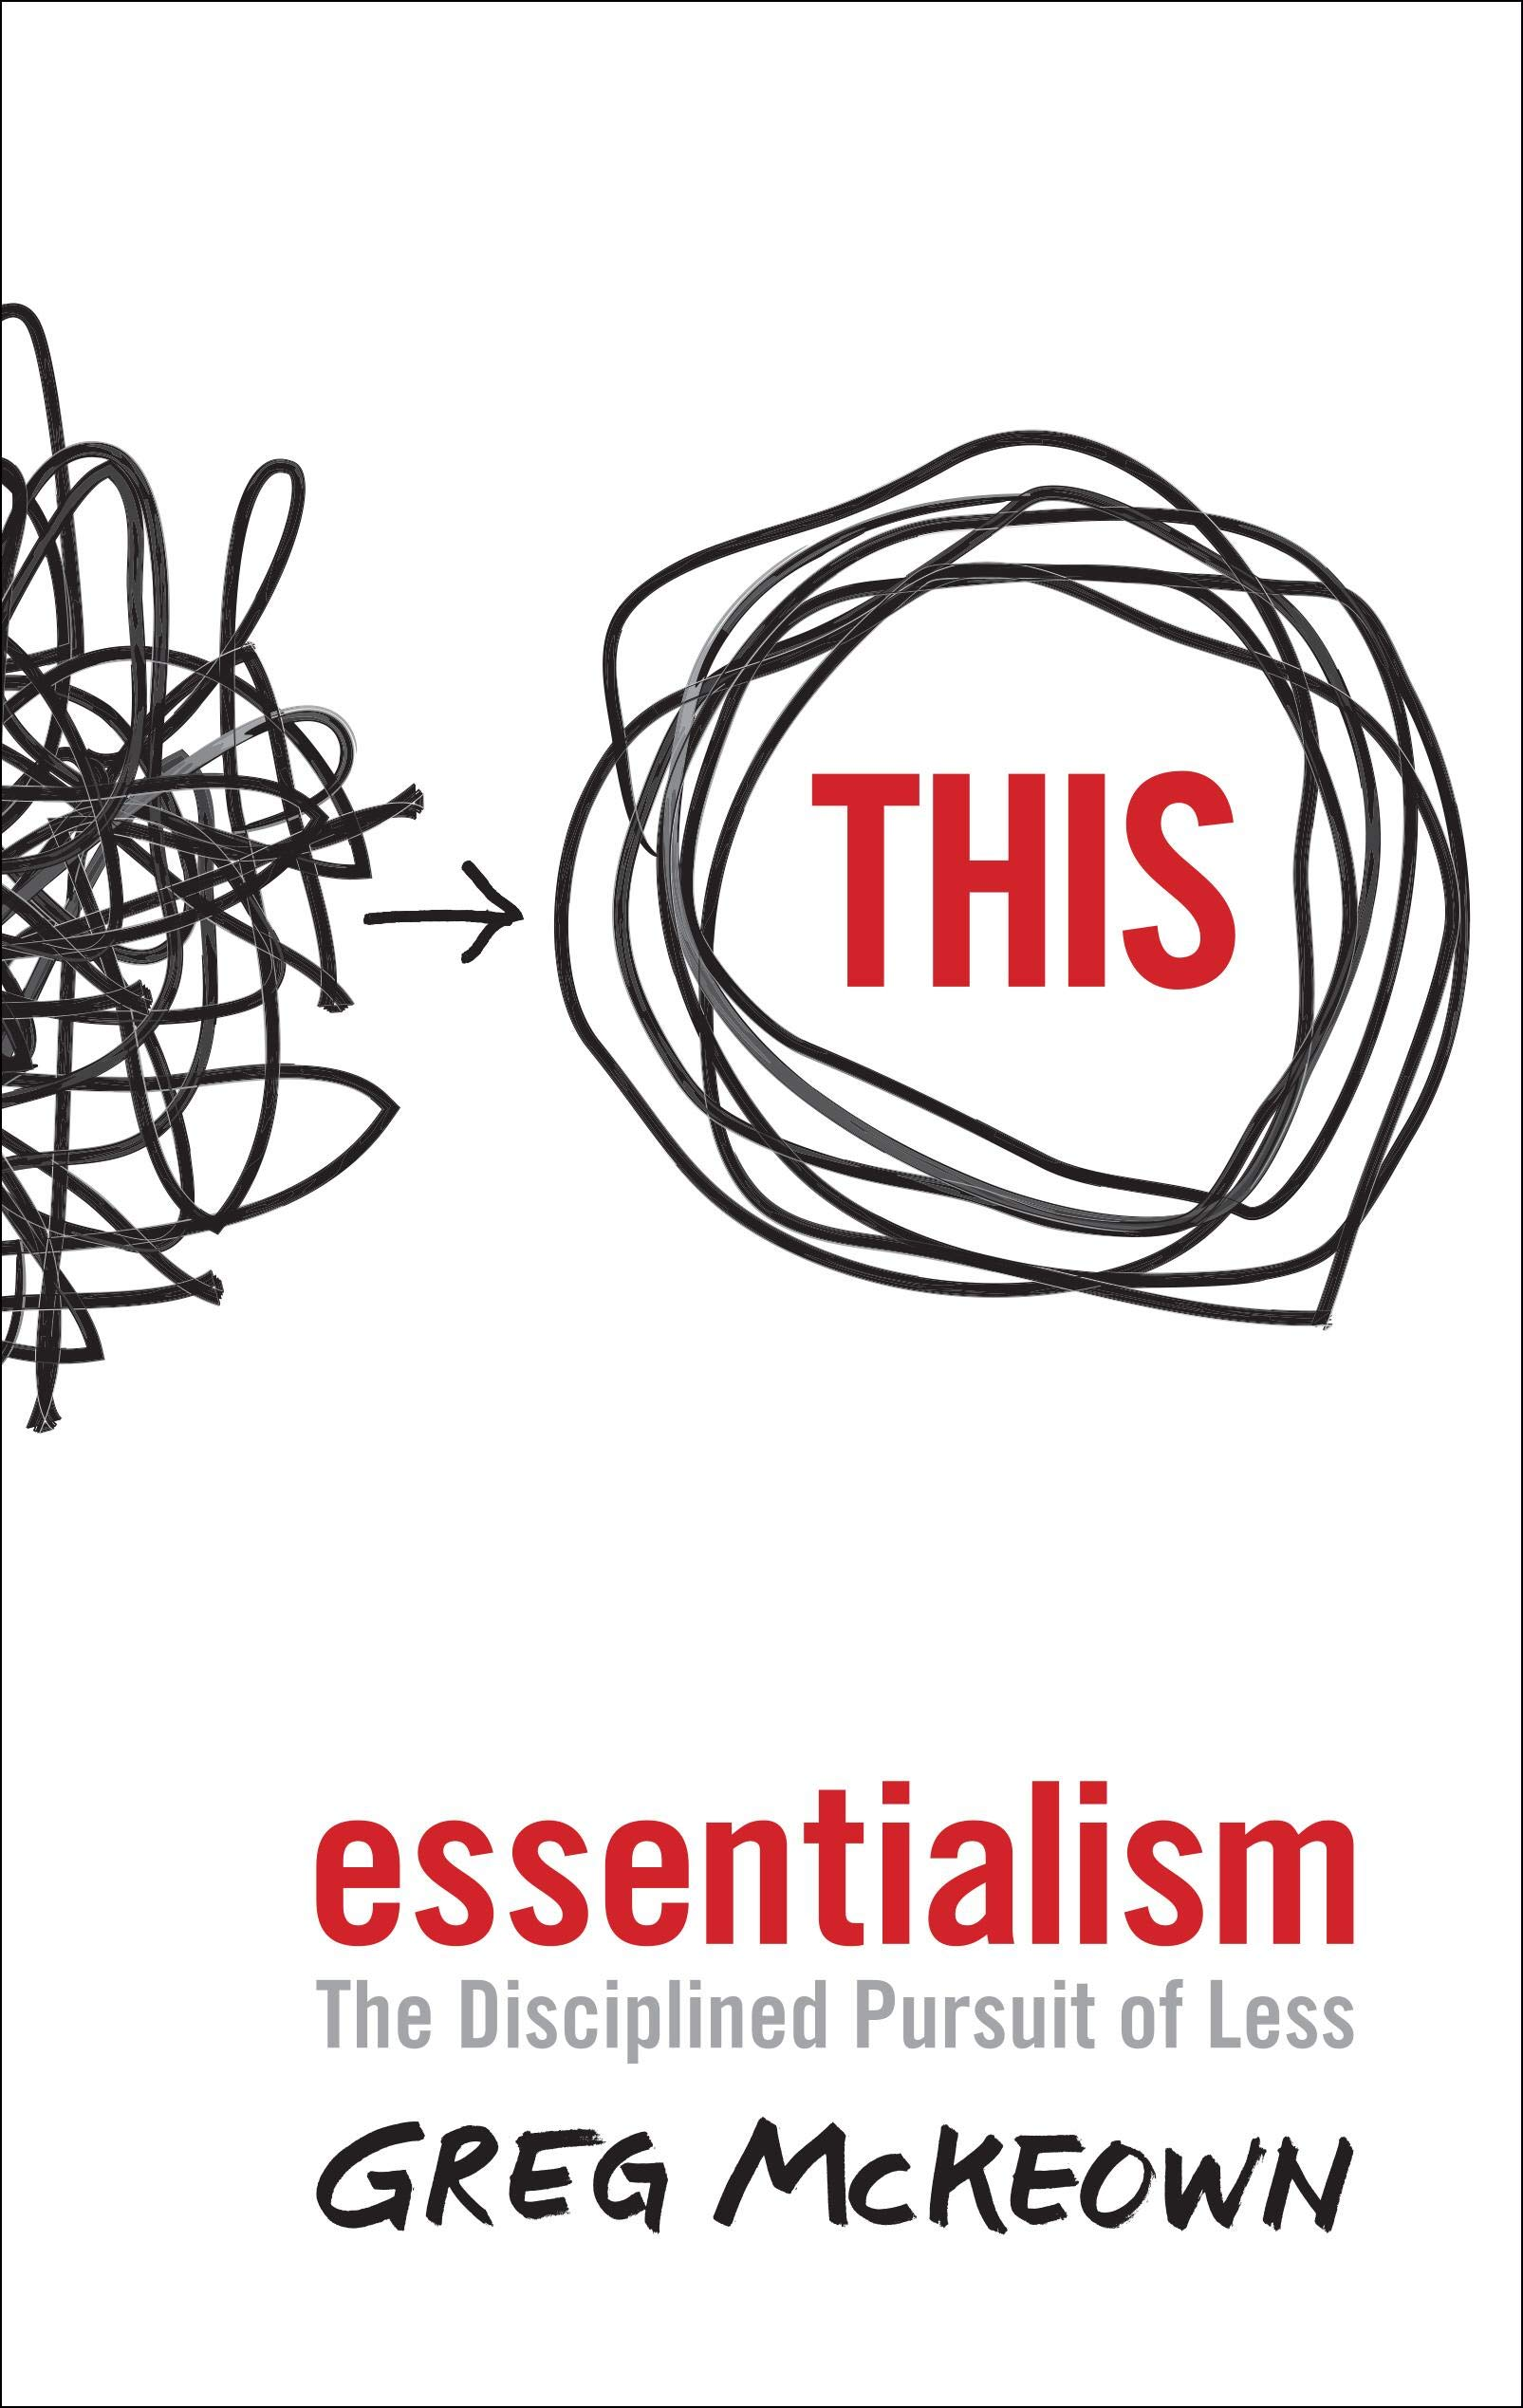 Amazon.it: Essentialism: The Disciplined Pursuit of Less - McKeown, Greg -  Libri in altre lingue